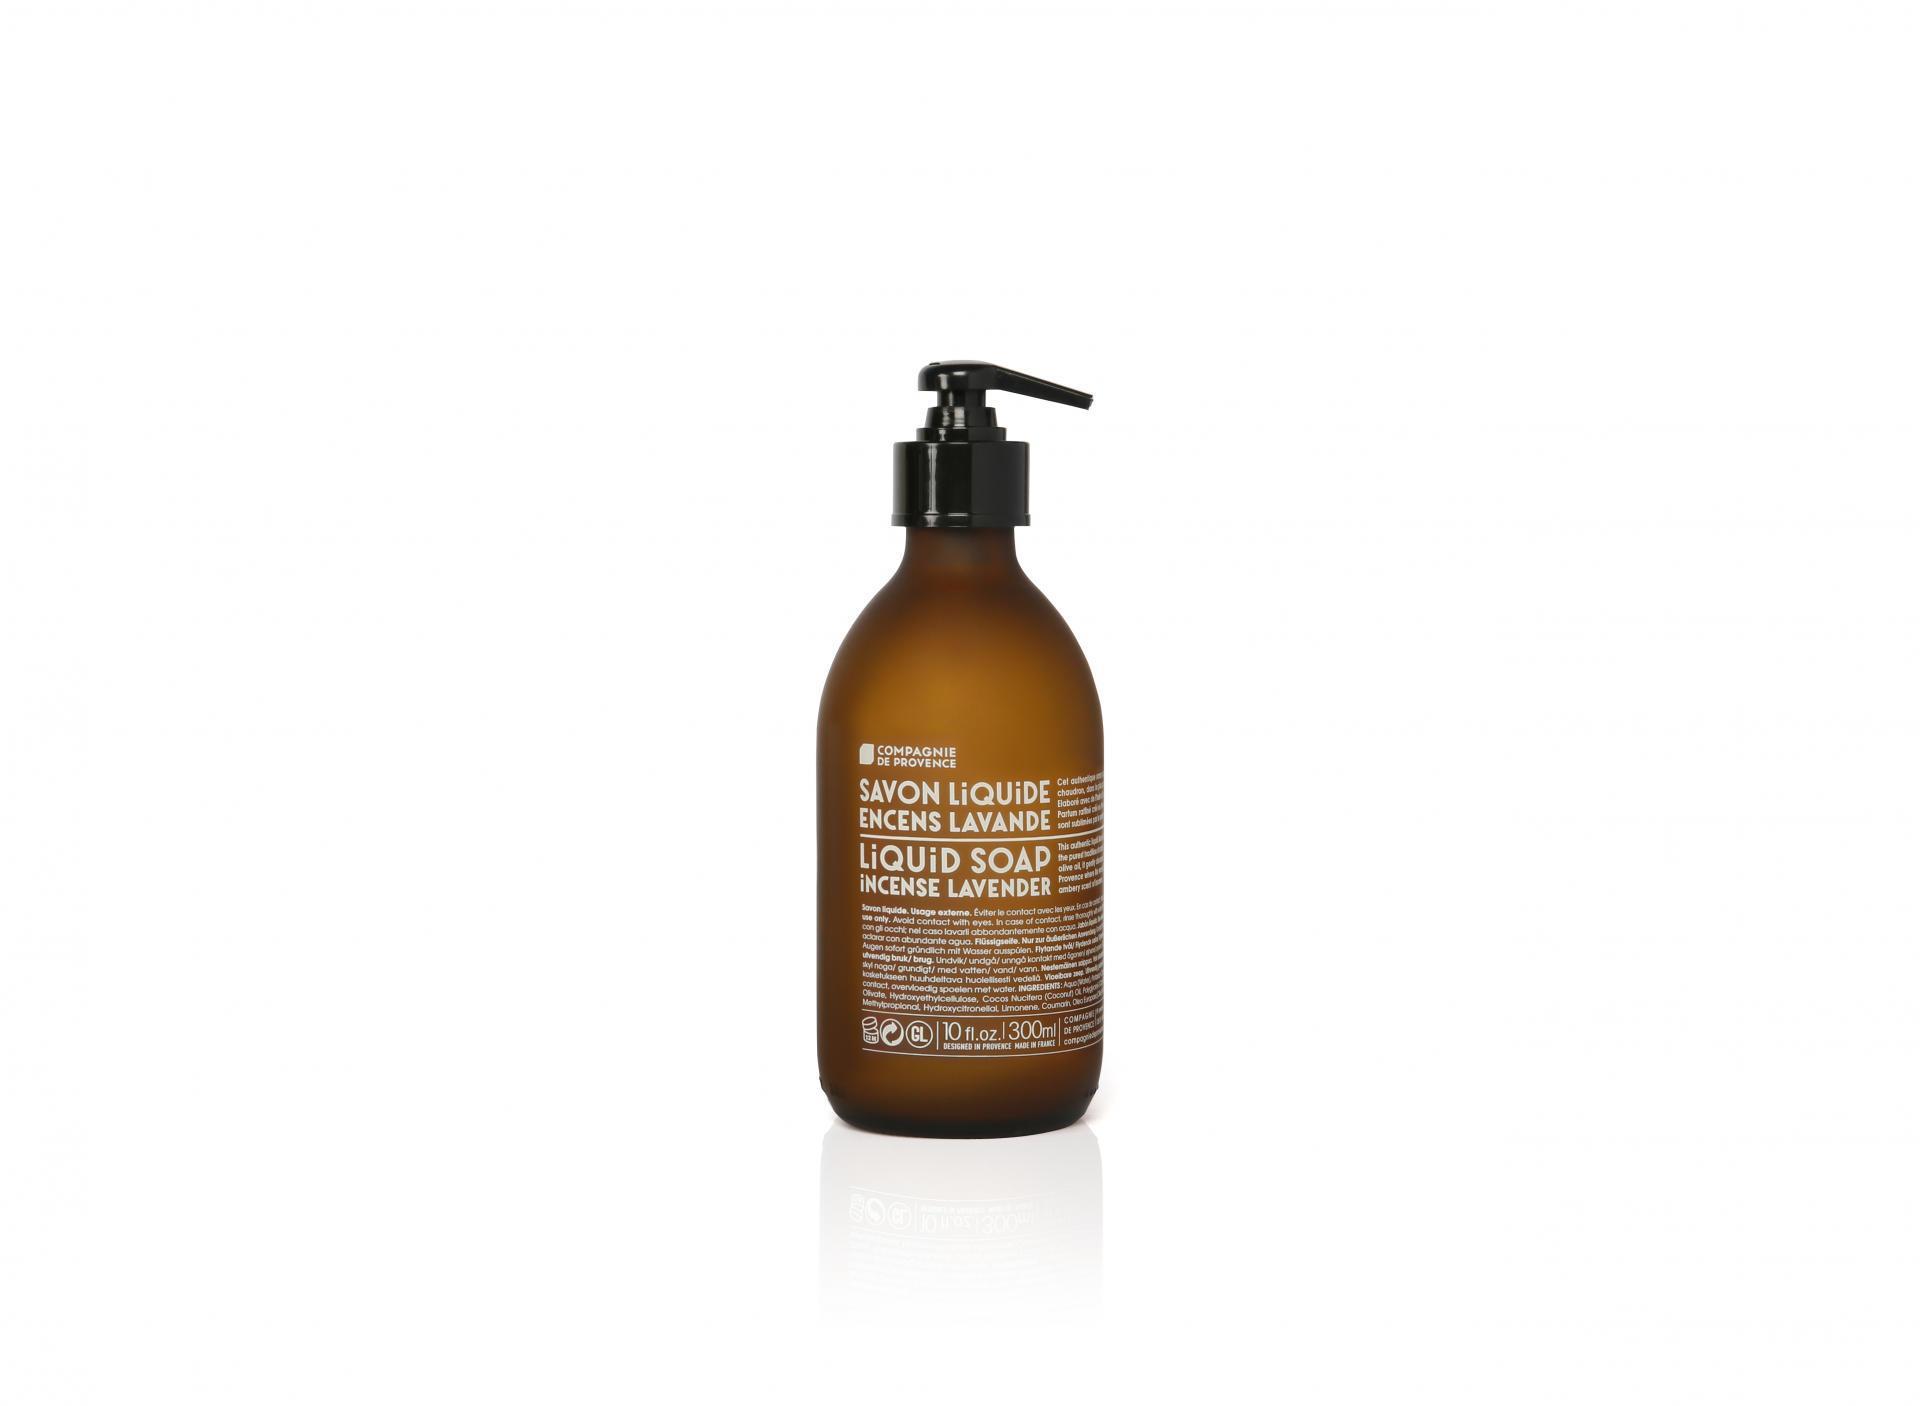 COMPAGNIE DE PROVENCE Tekuté mýdlo Oliva a levandule 300ml, hnědá barva, sklo